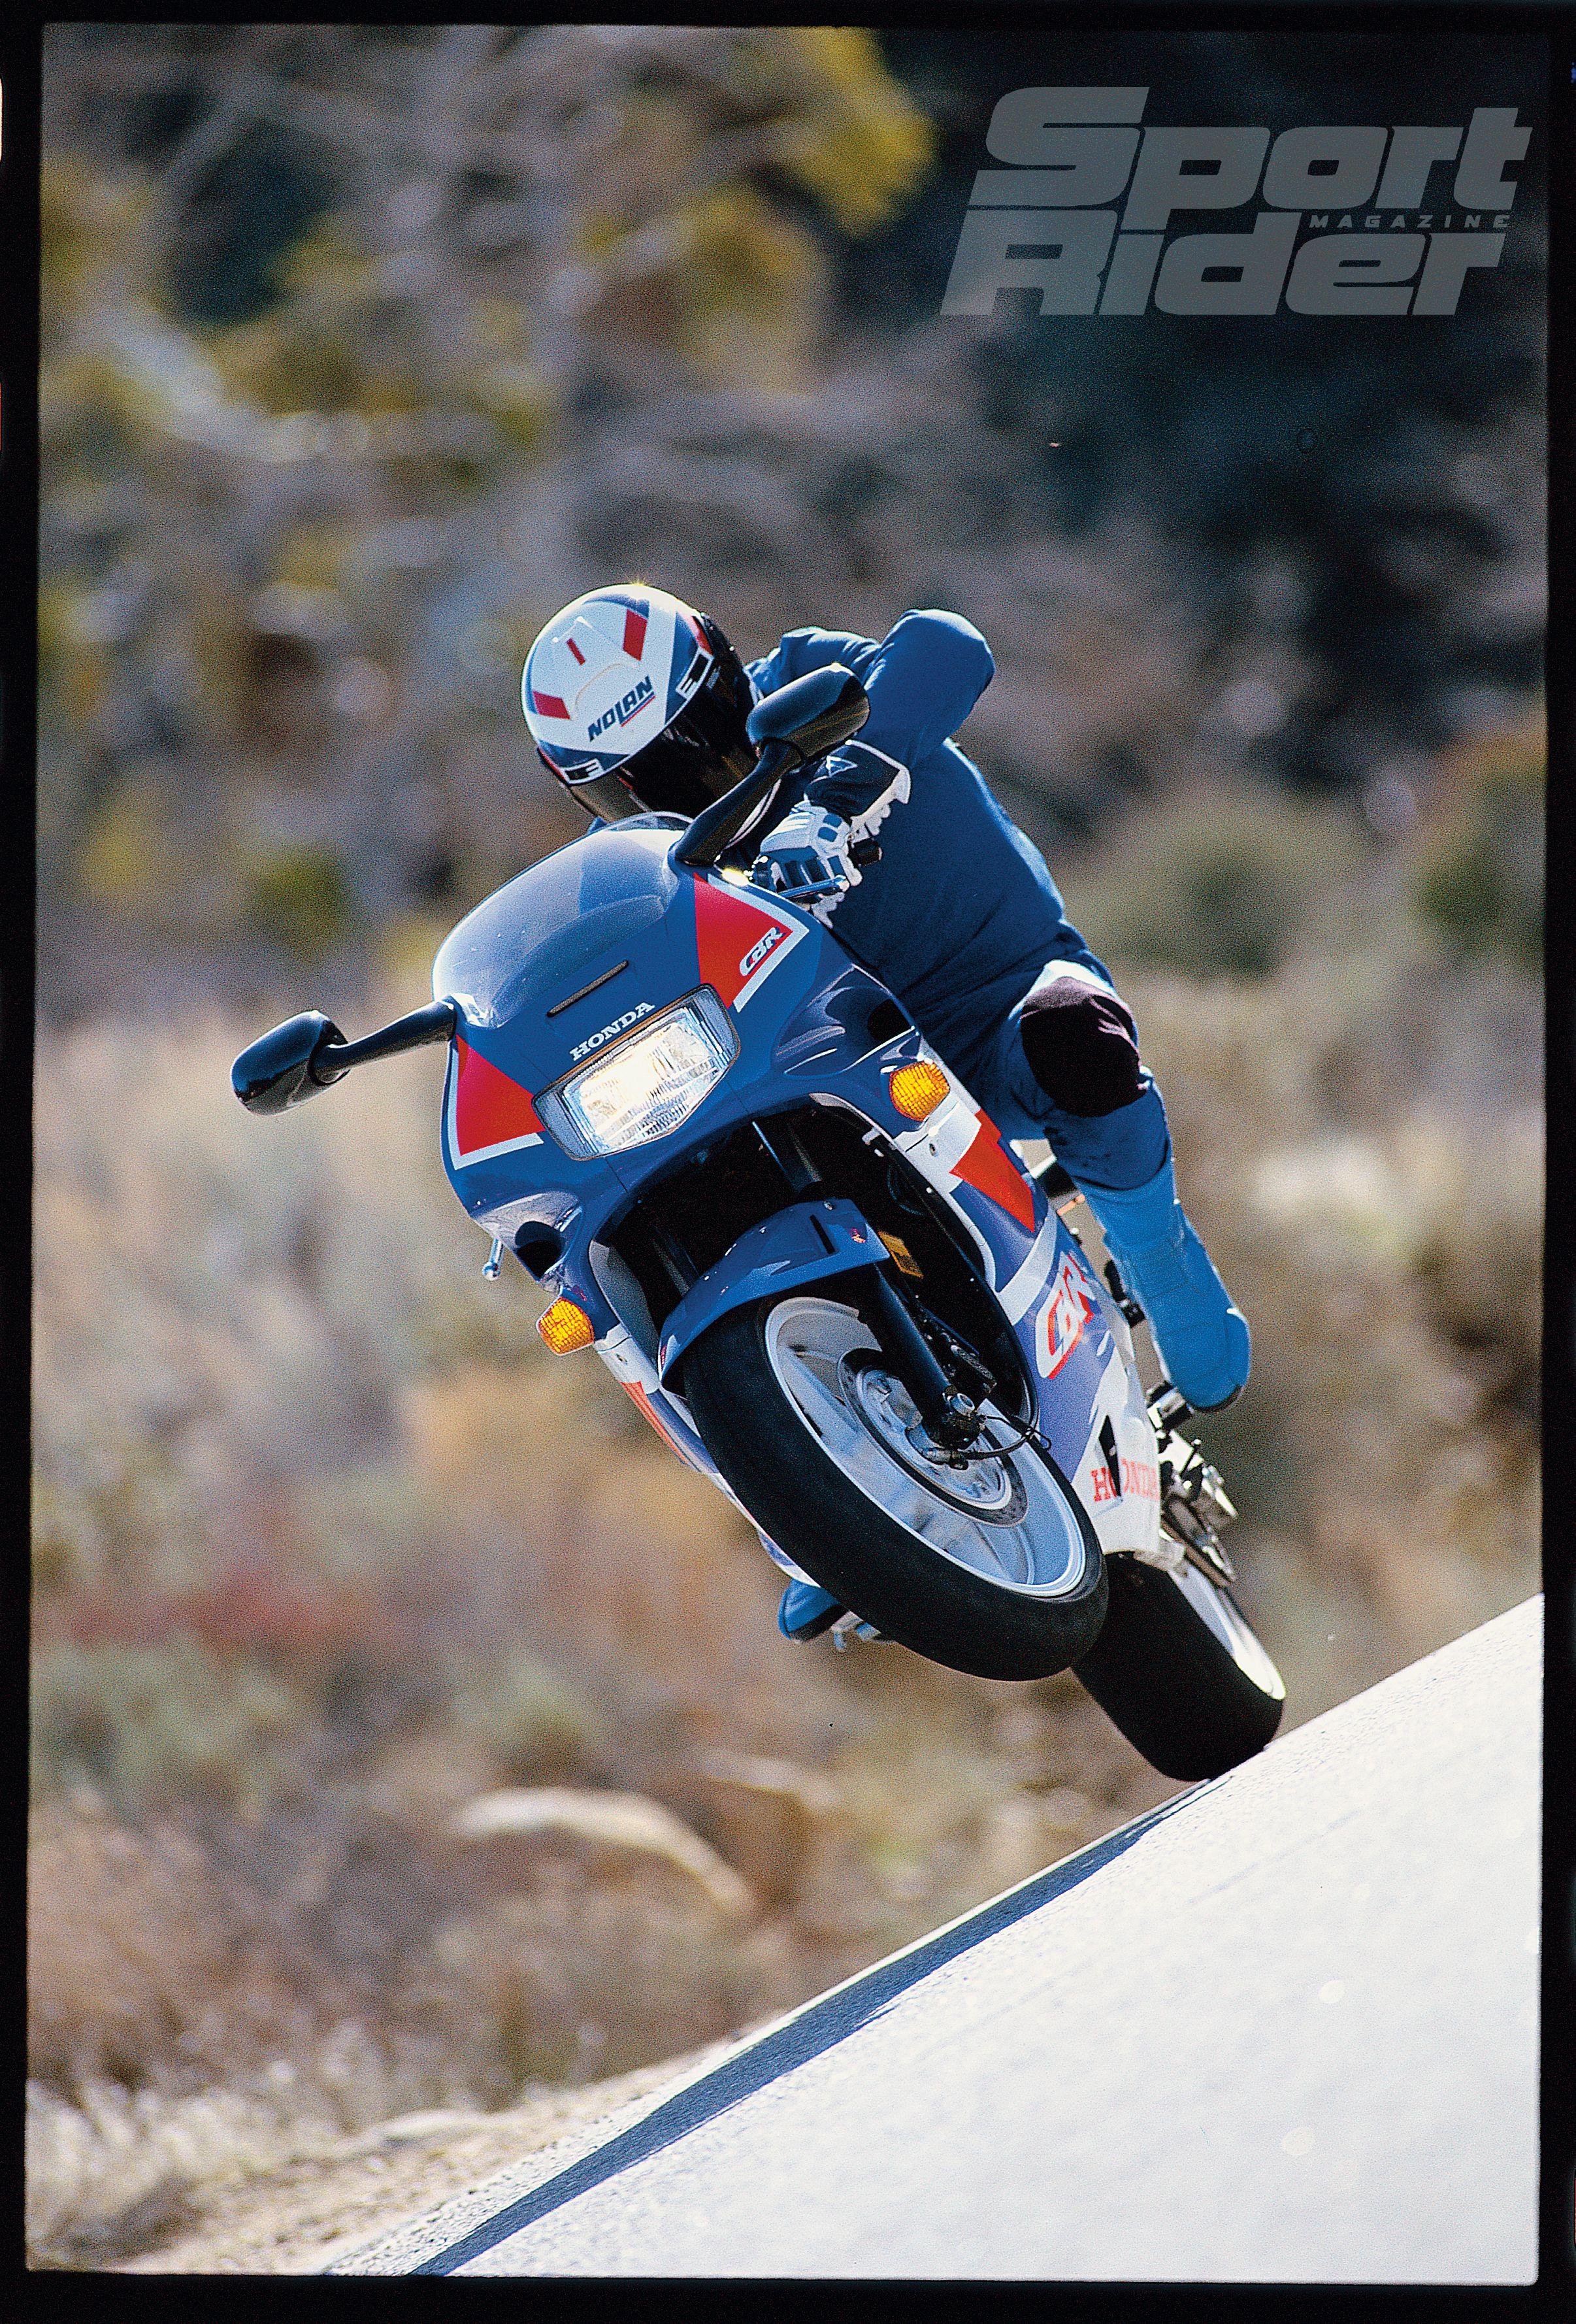 Great Sportbikes of the Past: 1991-1998 Honda CBR600F2-F3